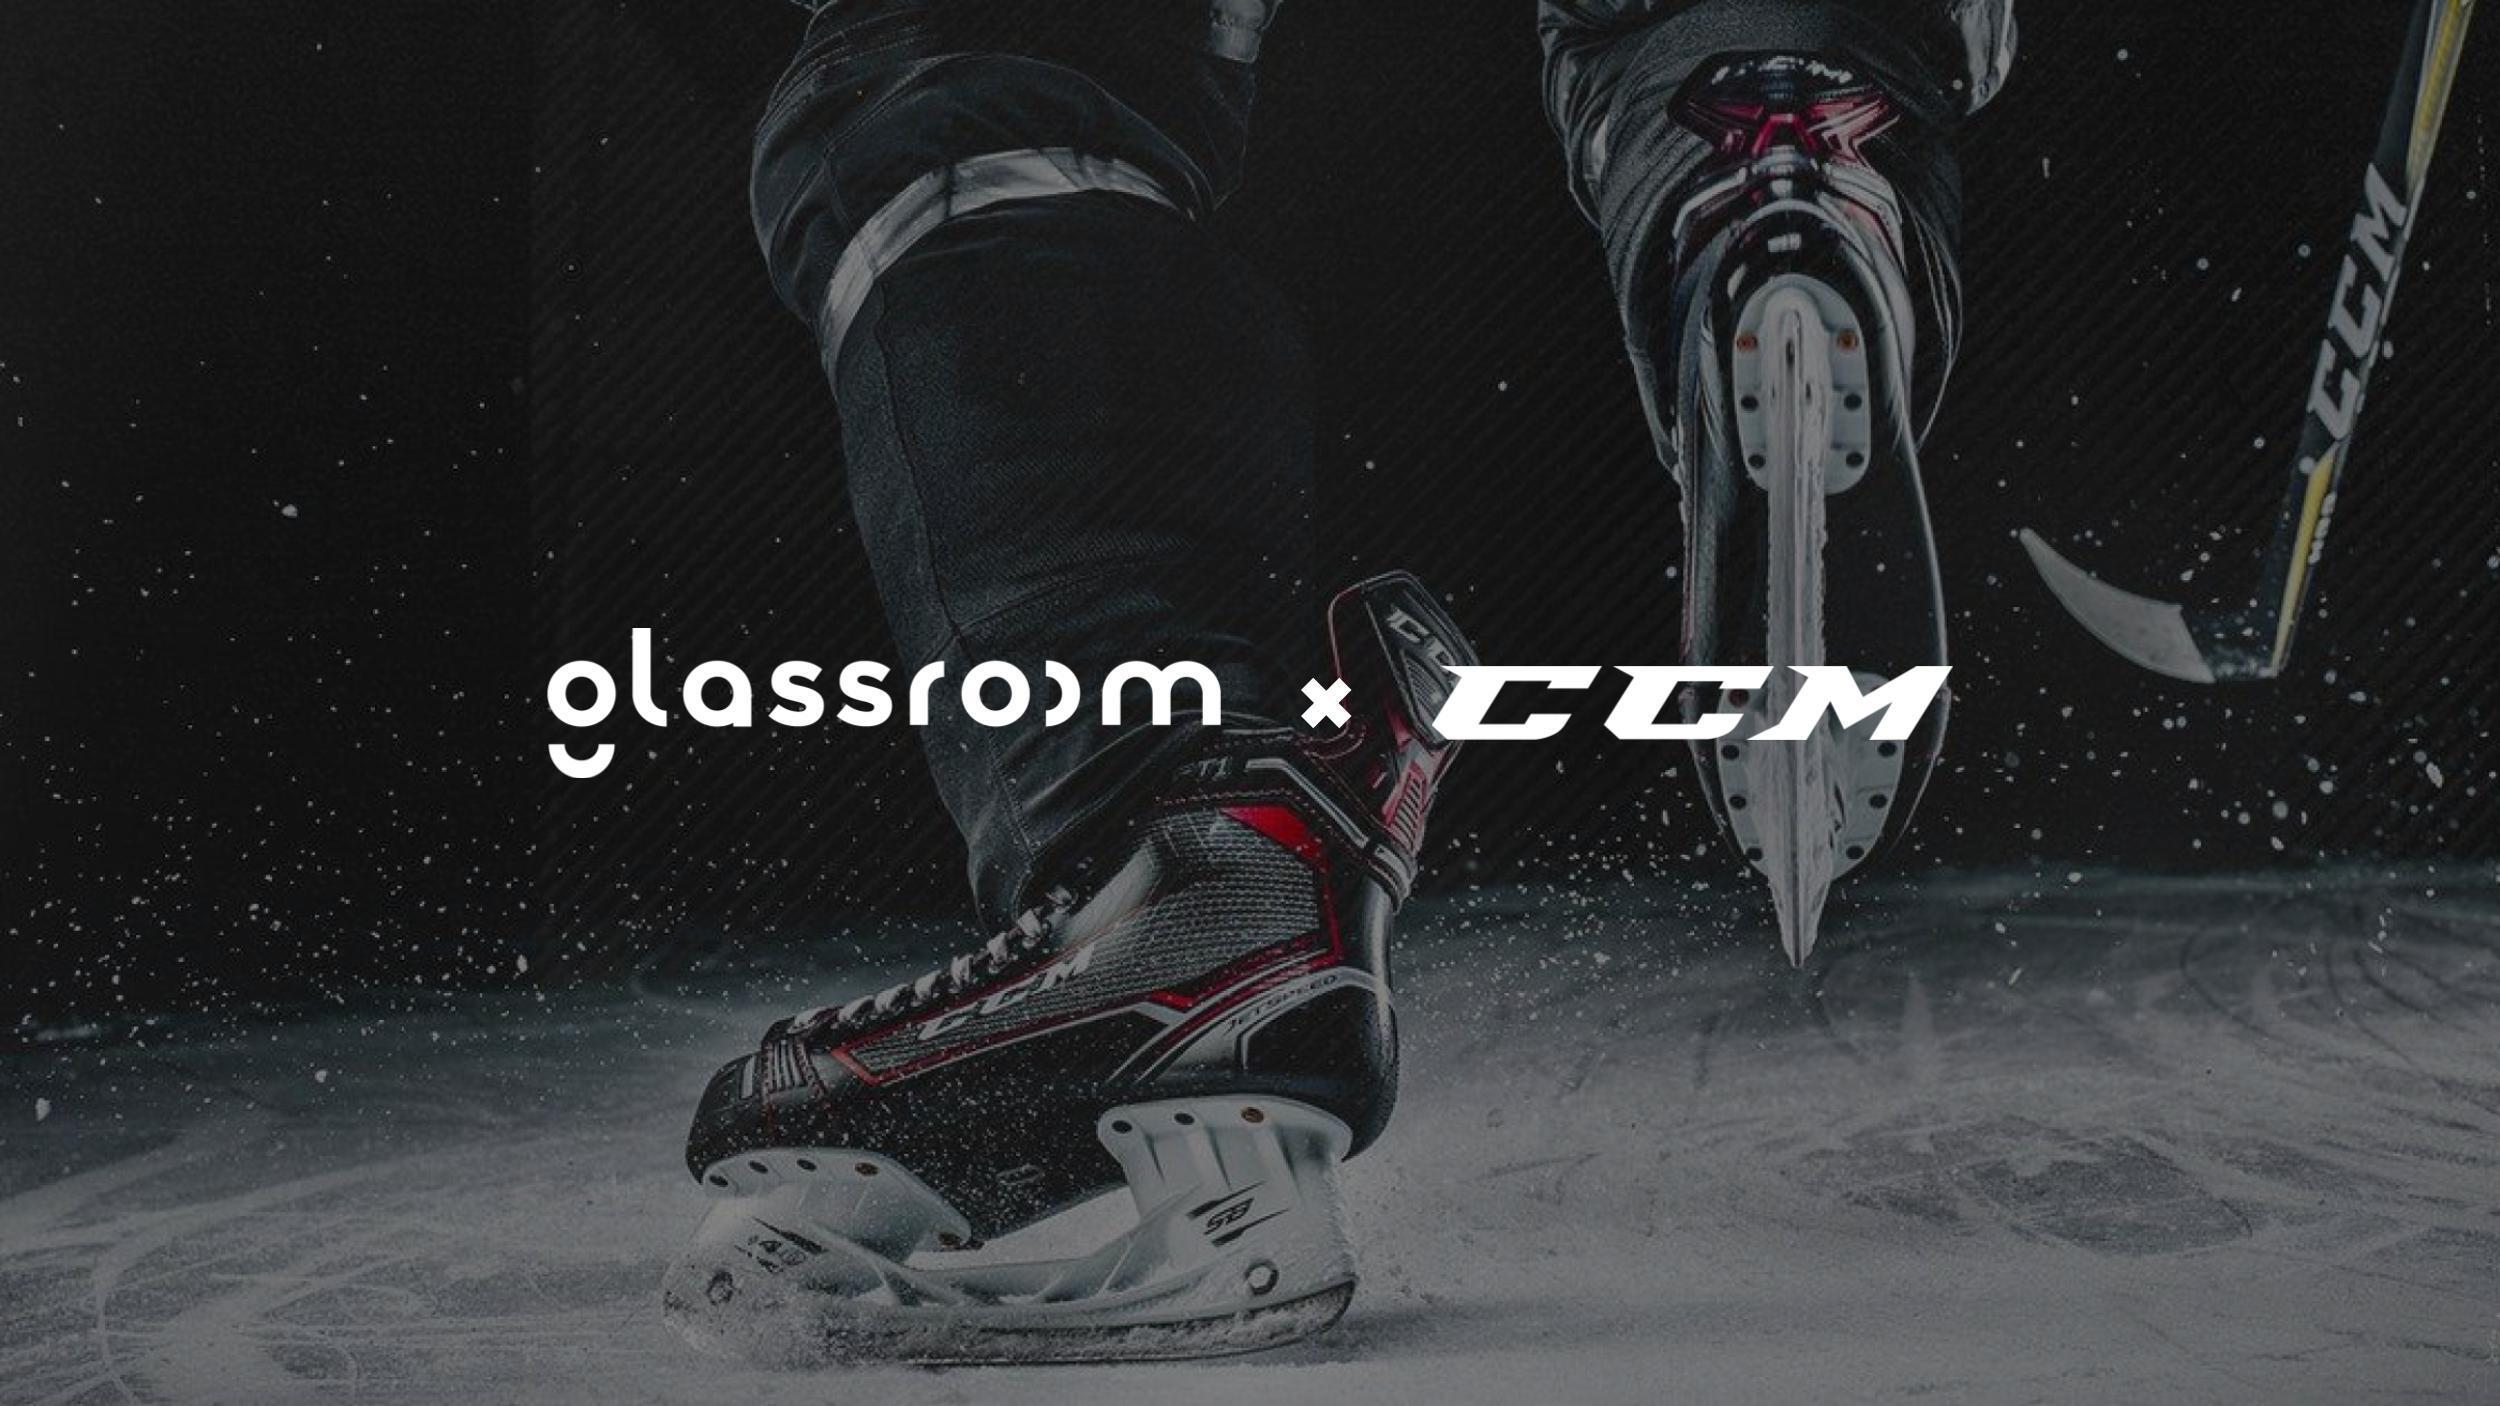 ccm glassroom